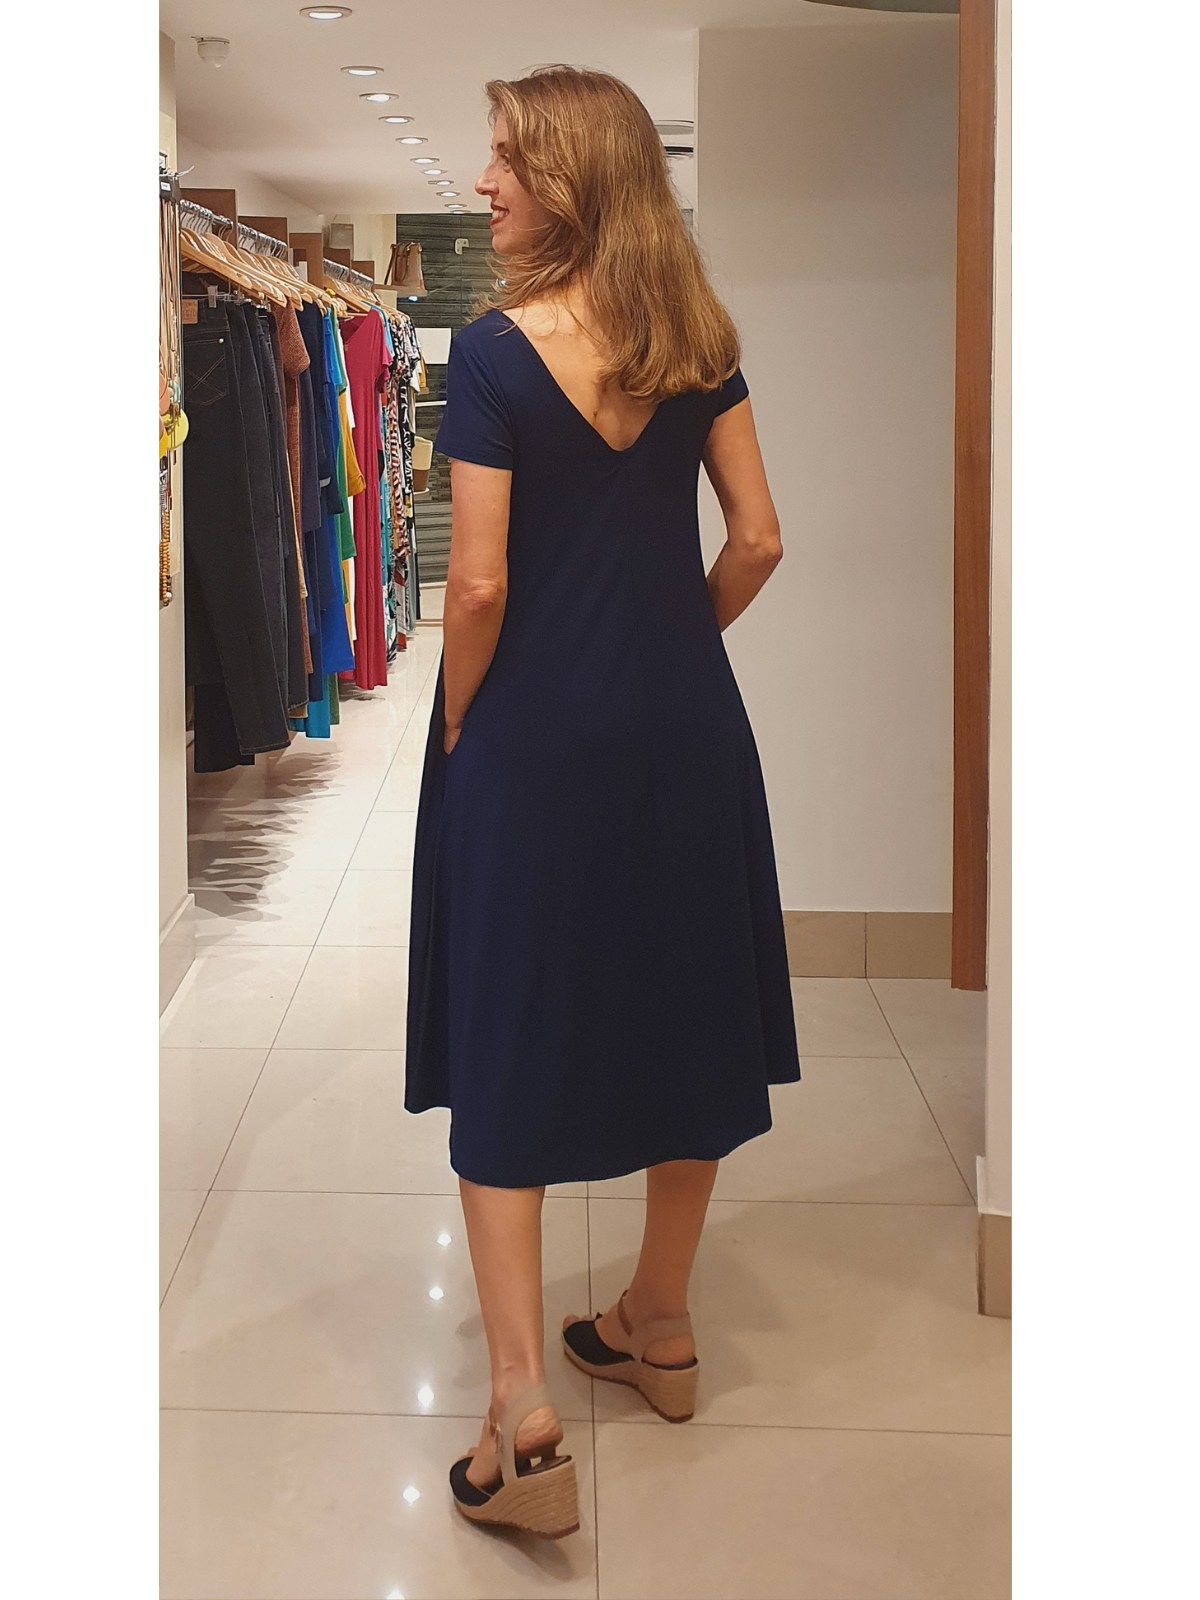 Vestido Carla Amplo em Malha Lisa Viscolycra Premium